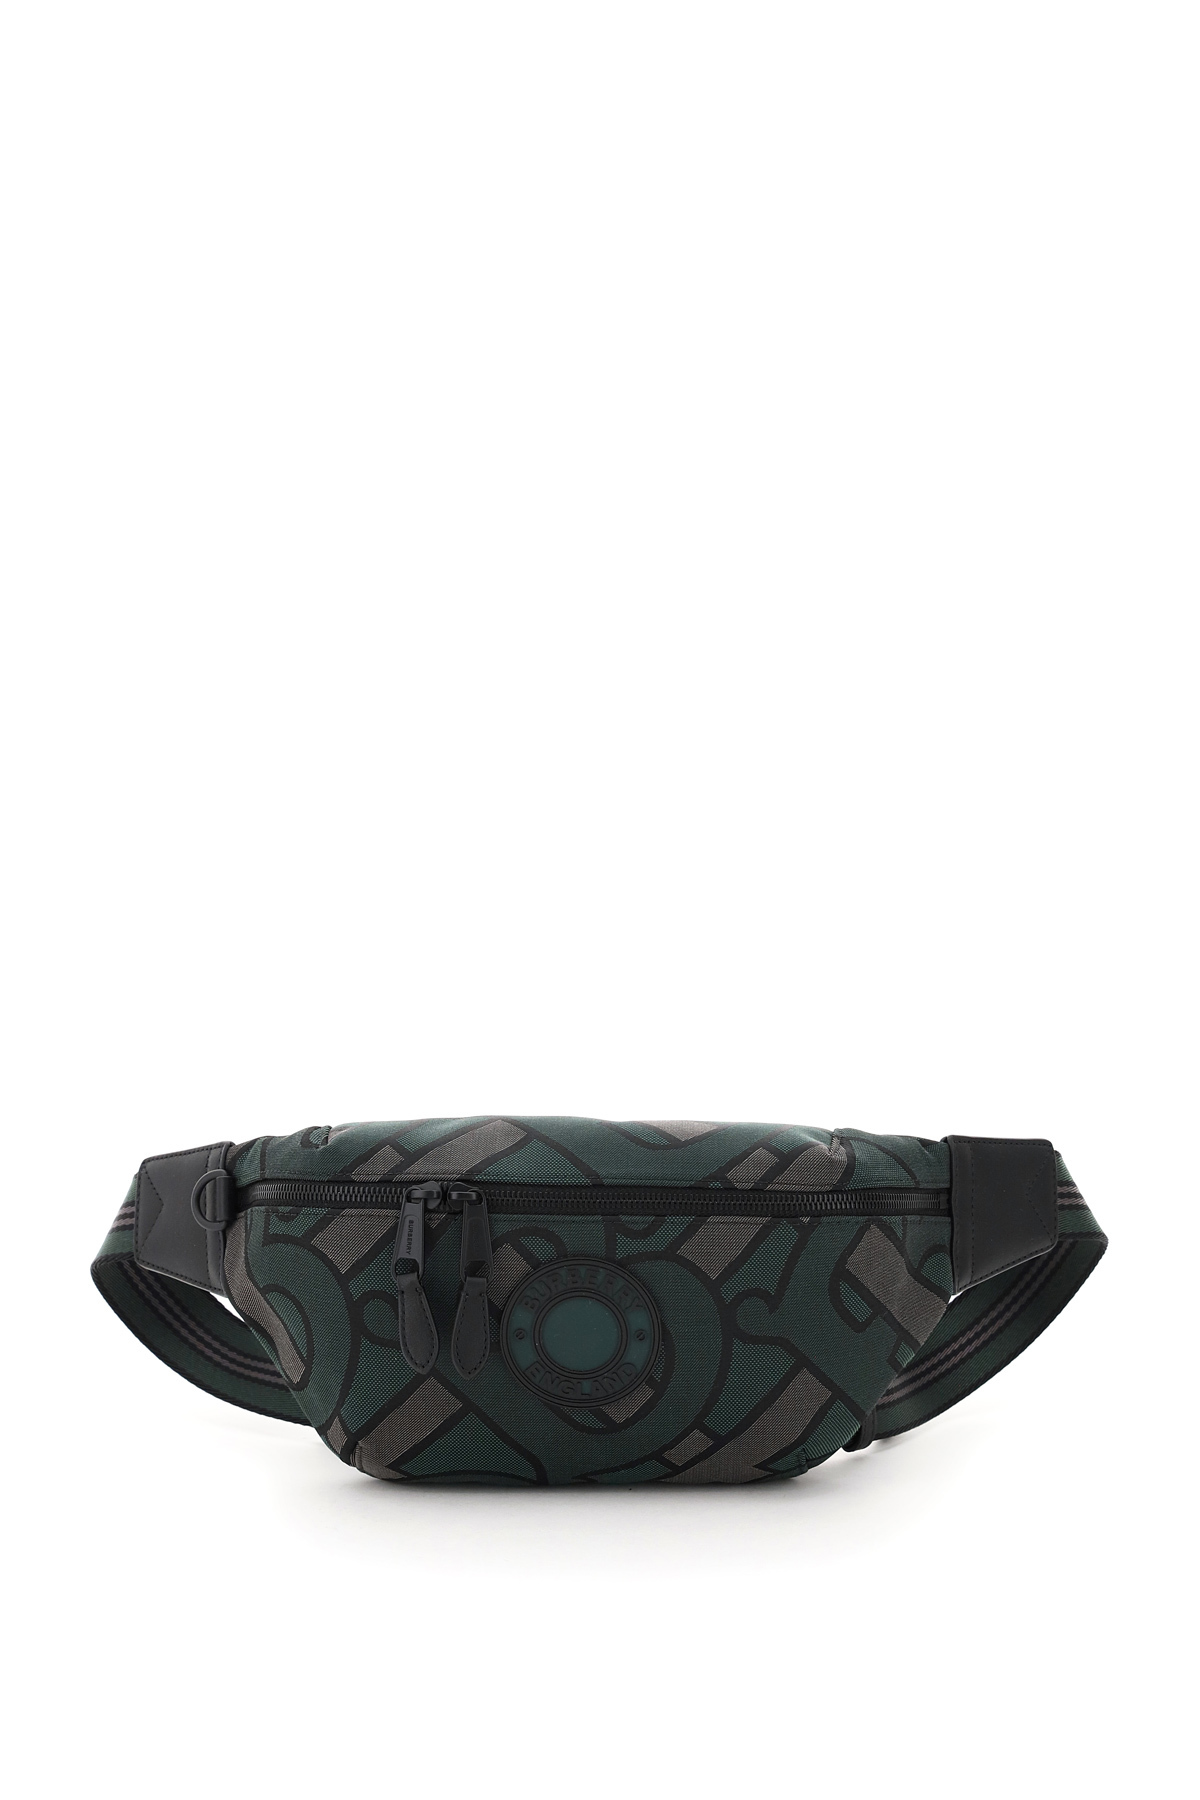 BURBERRY SONNY MEDIUM BELT BAG OS Green, Grey, Black Leather, Cotton, Technical